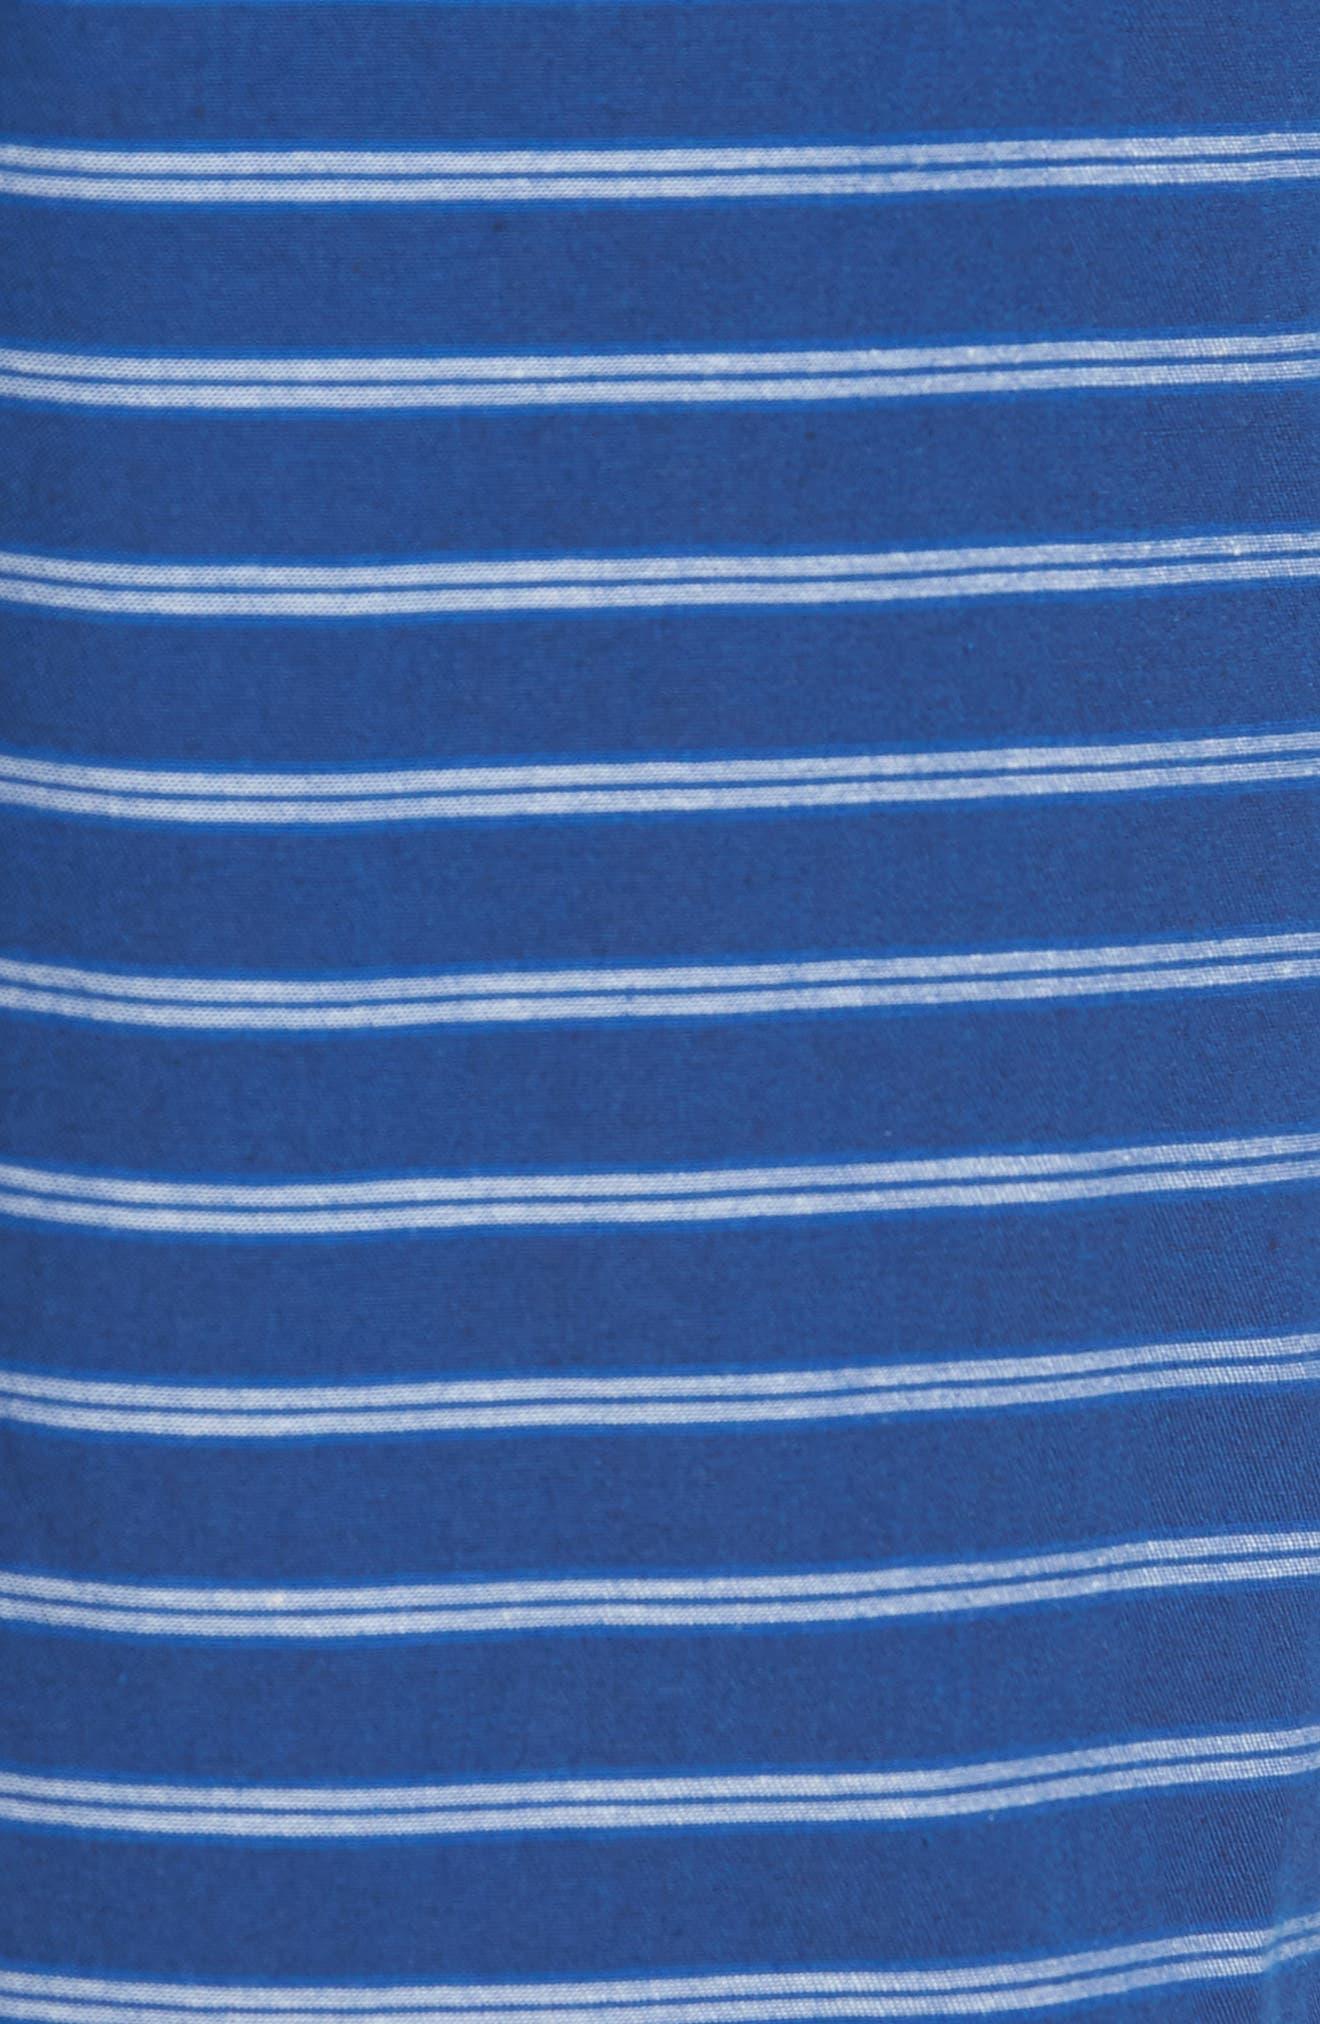 Slim Fit Stripe Beach Shorts,                             Alternate thumbnail 5, color,                             Blue Stripe